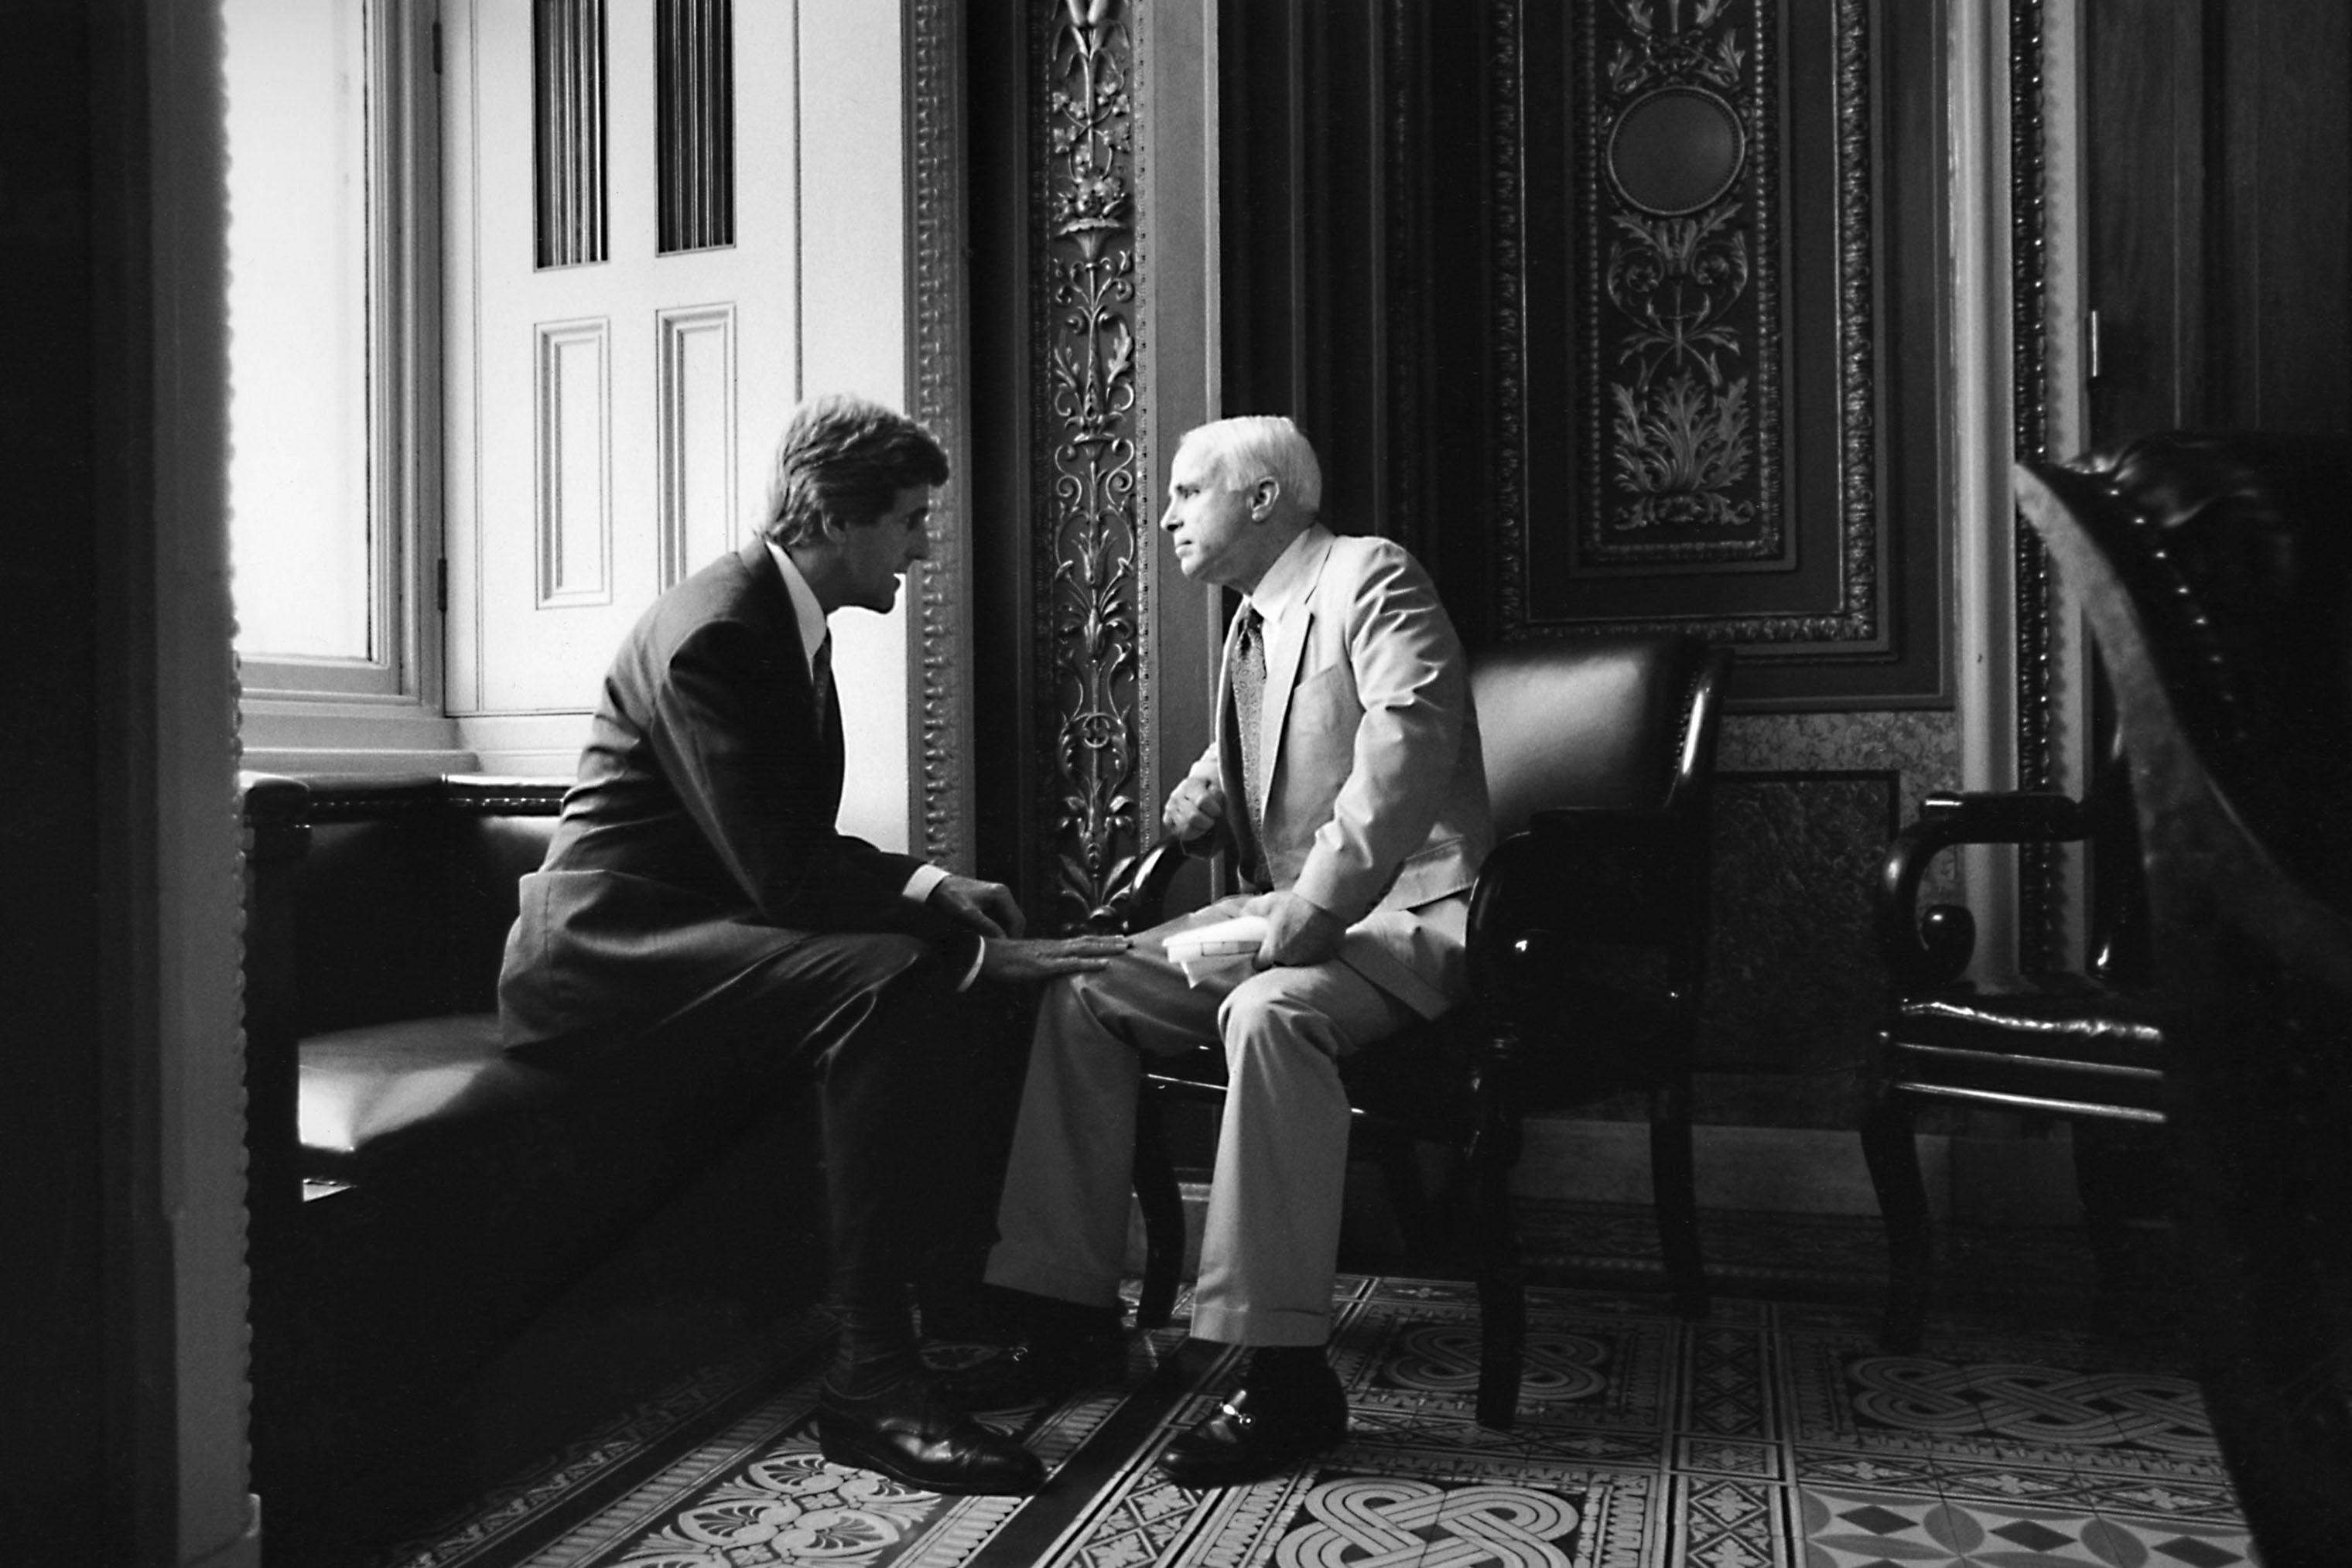 Sen. John Kerry chats with Sen. John McCain in Washington in 1997.